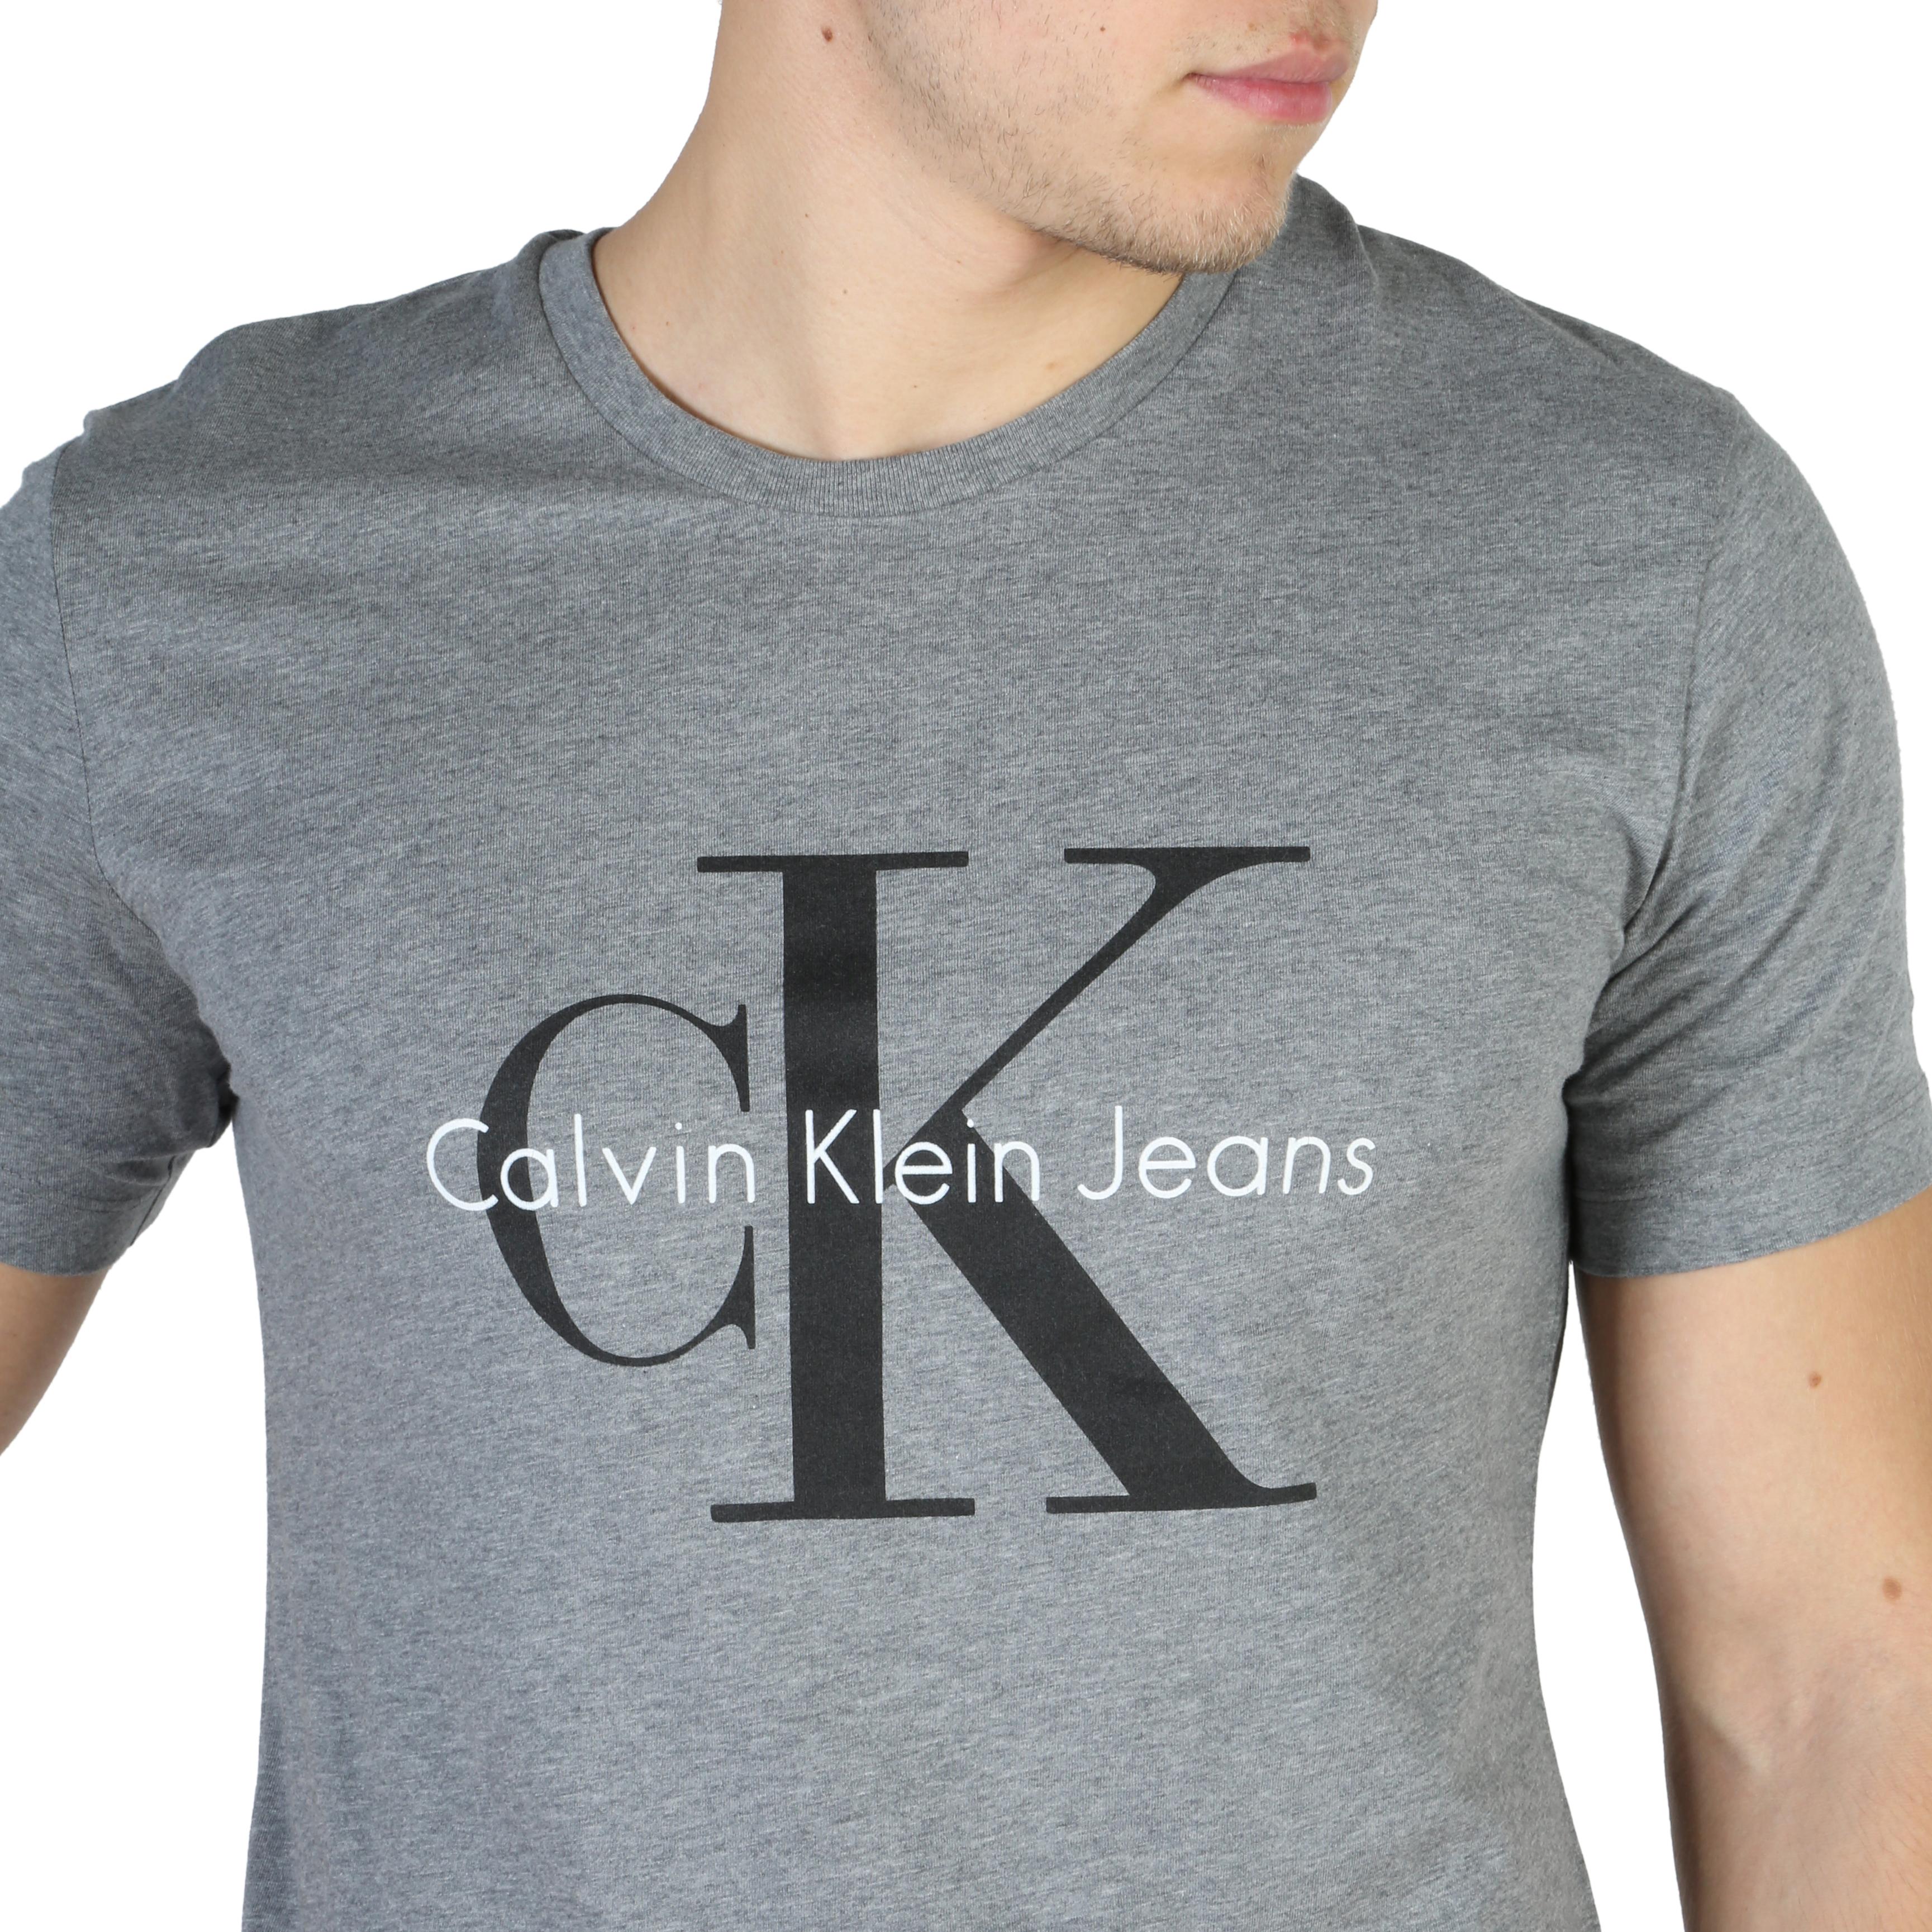 20323-Calvin-Klein-J3IJ302251-Uomo-Grigio-104159-Calvin-Klein miniatura 3